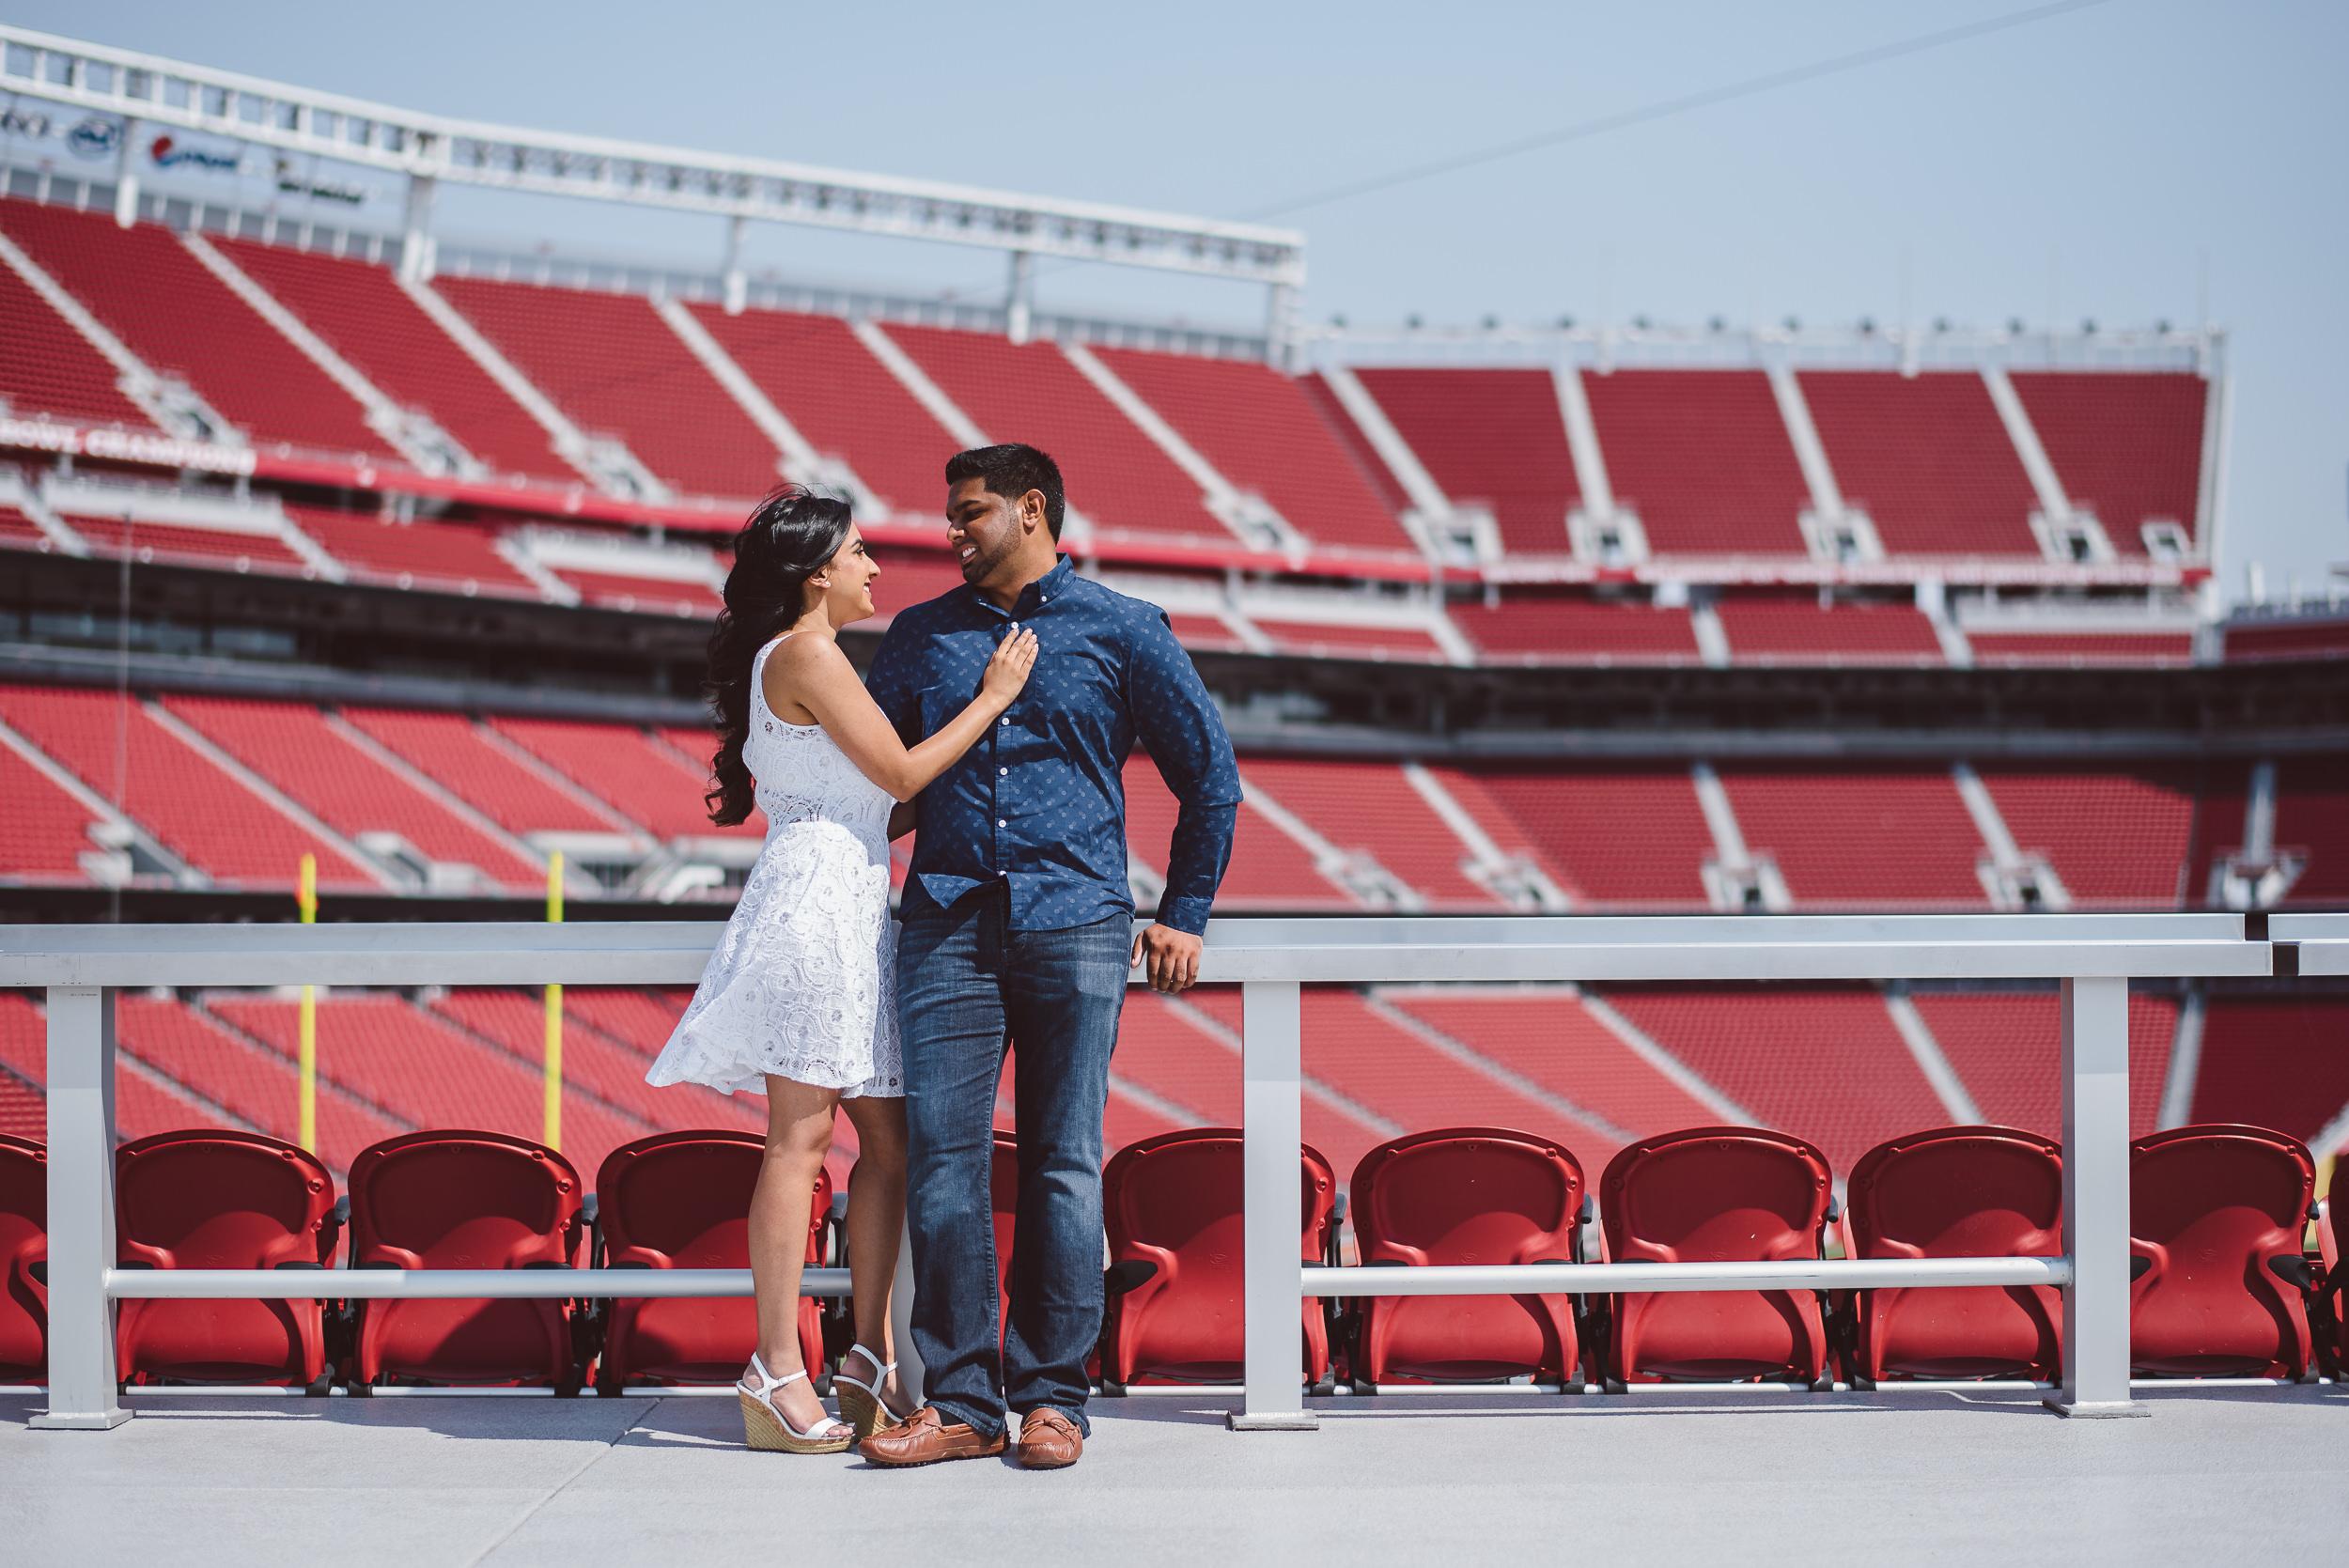 San-Francisco-49ers-Levis-Stadium-Engagement-Photography-002.jpg